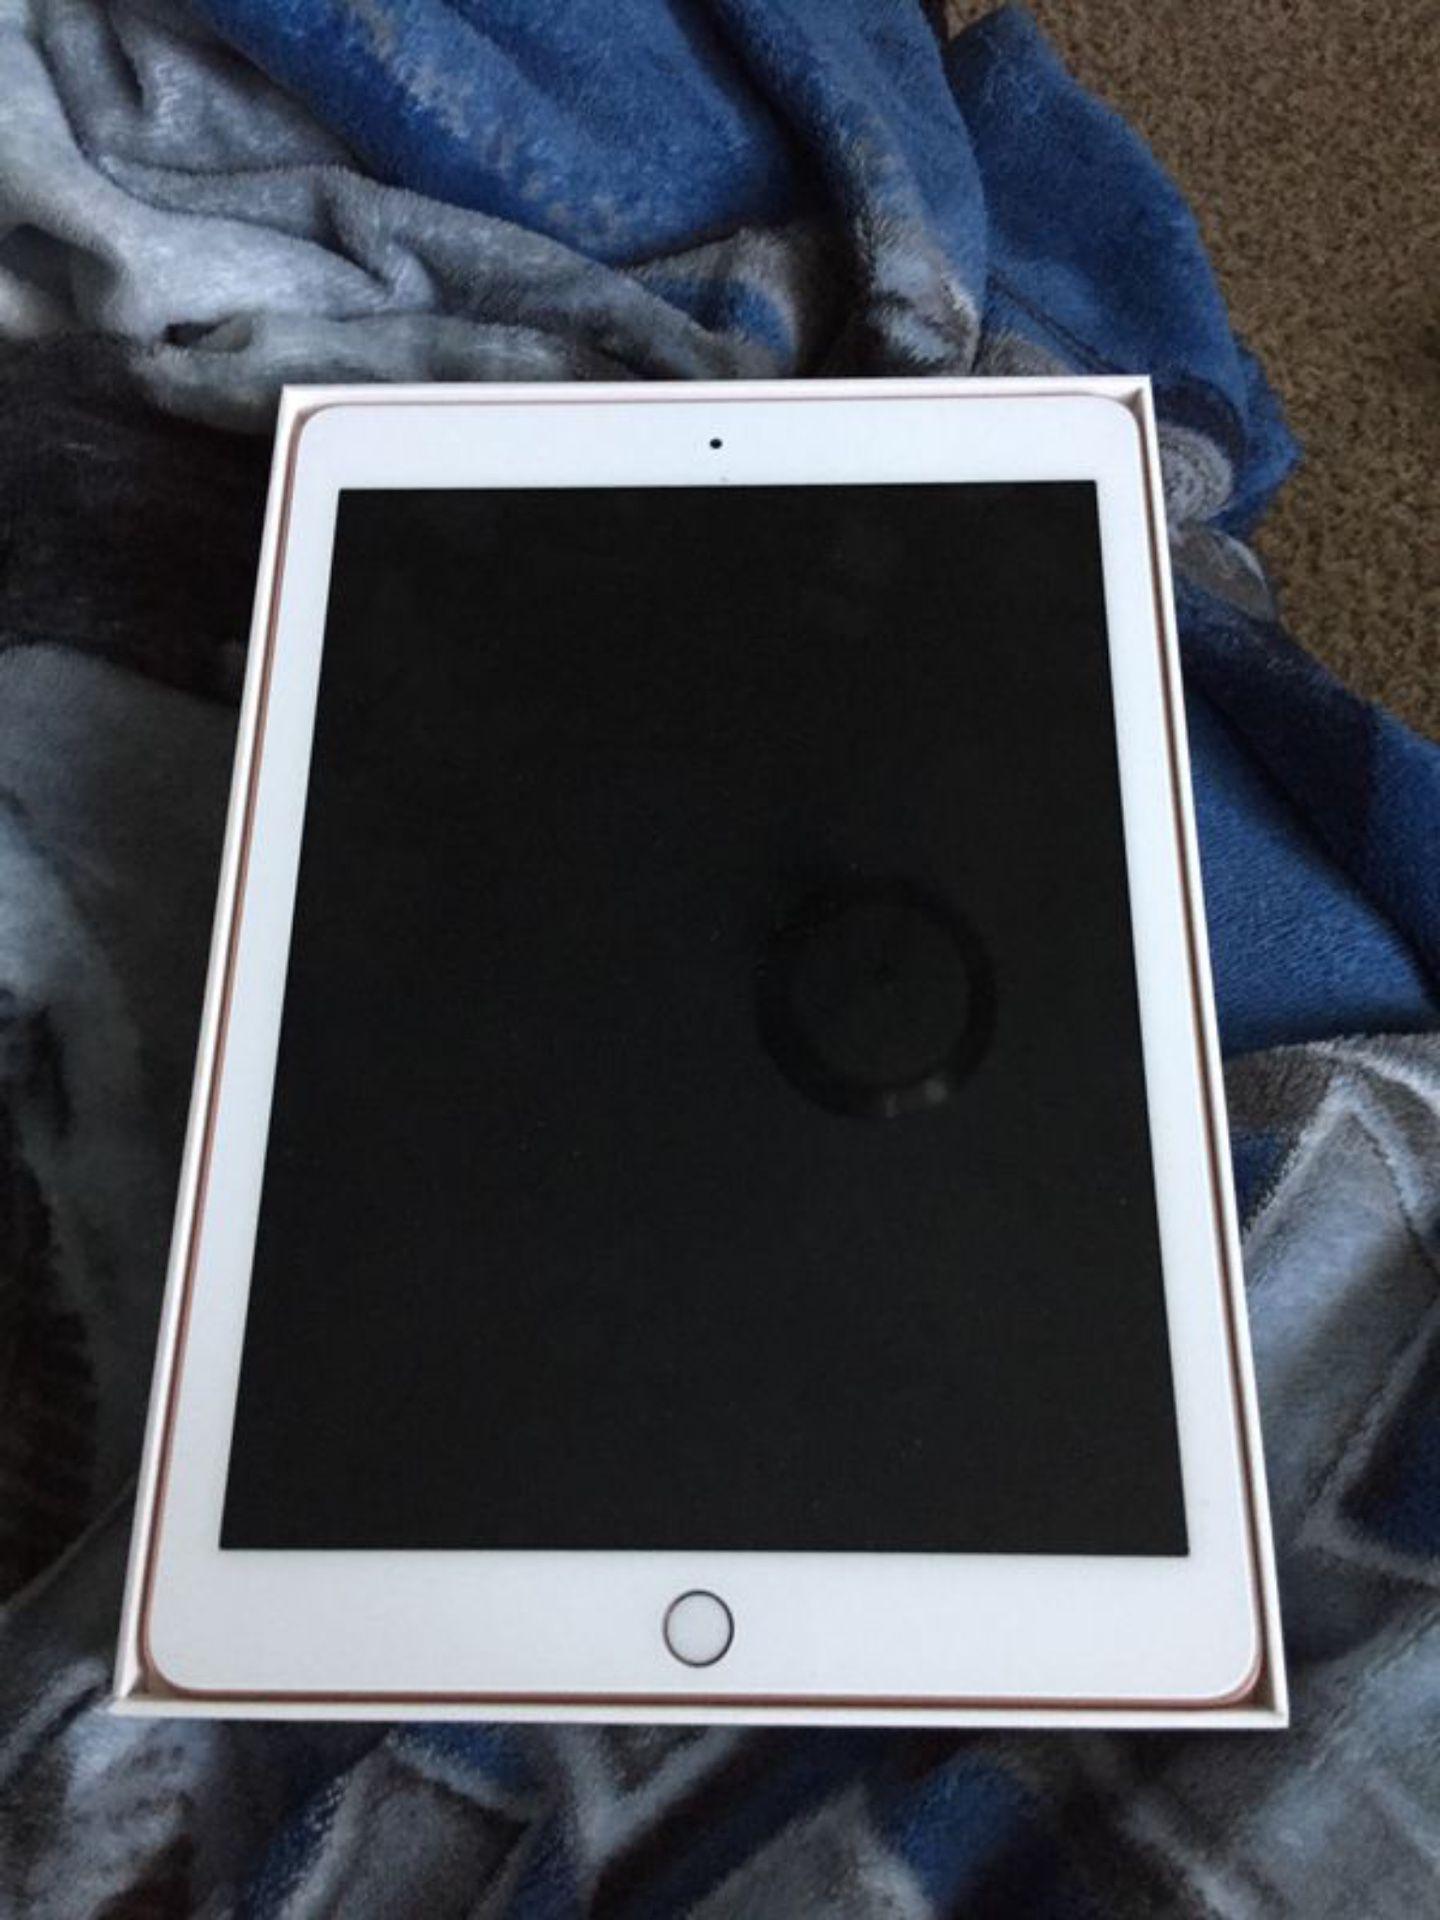 iPad 6th generation